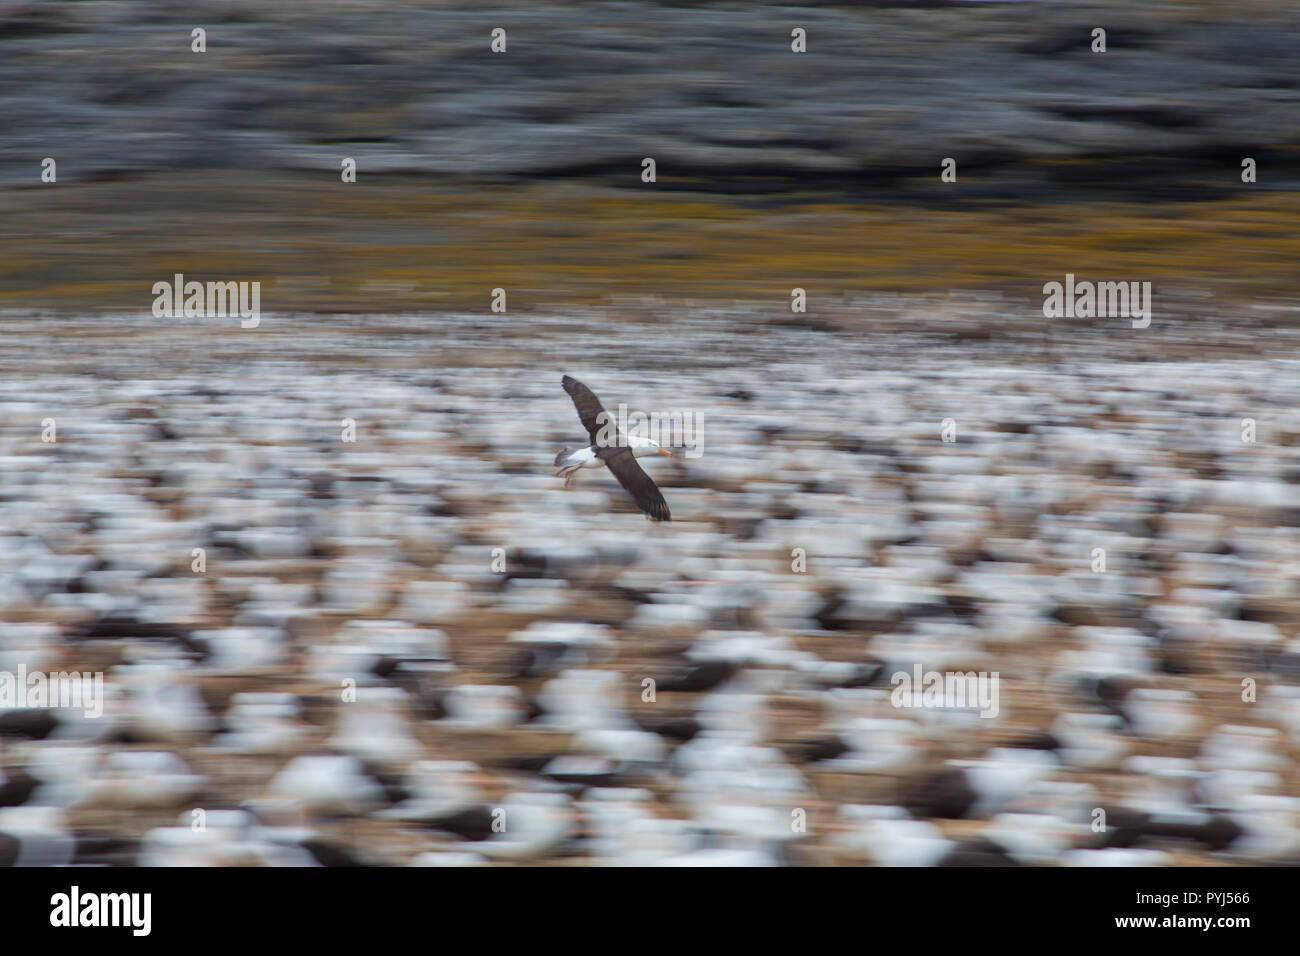 Black-browed albatross colony, Steeple Jason Island, Falklands. - Stock Image